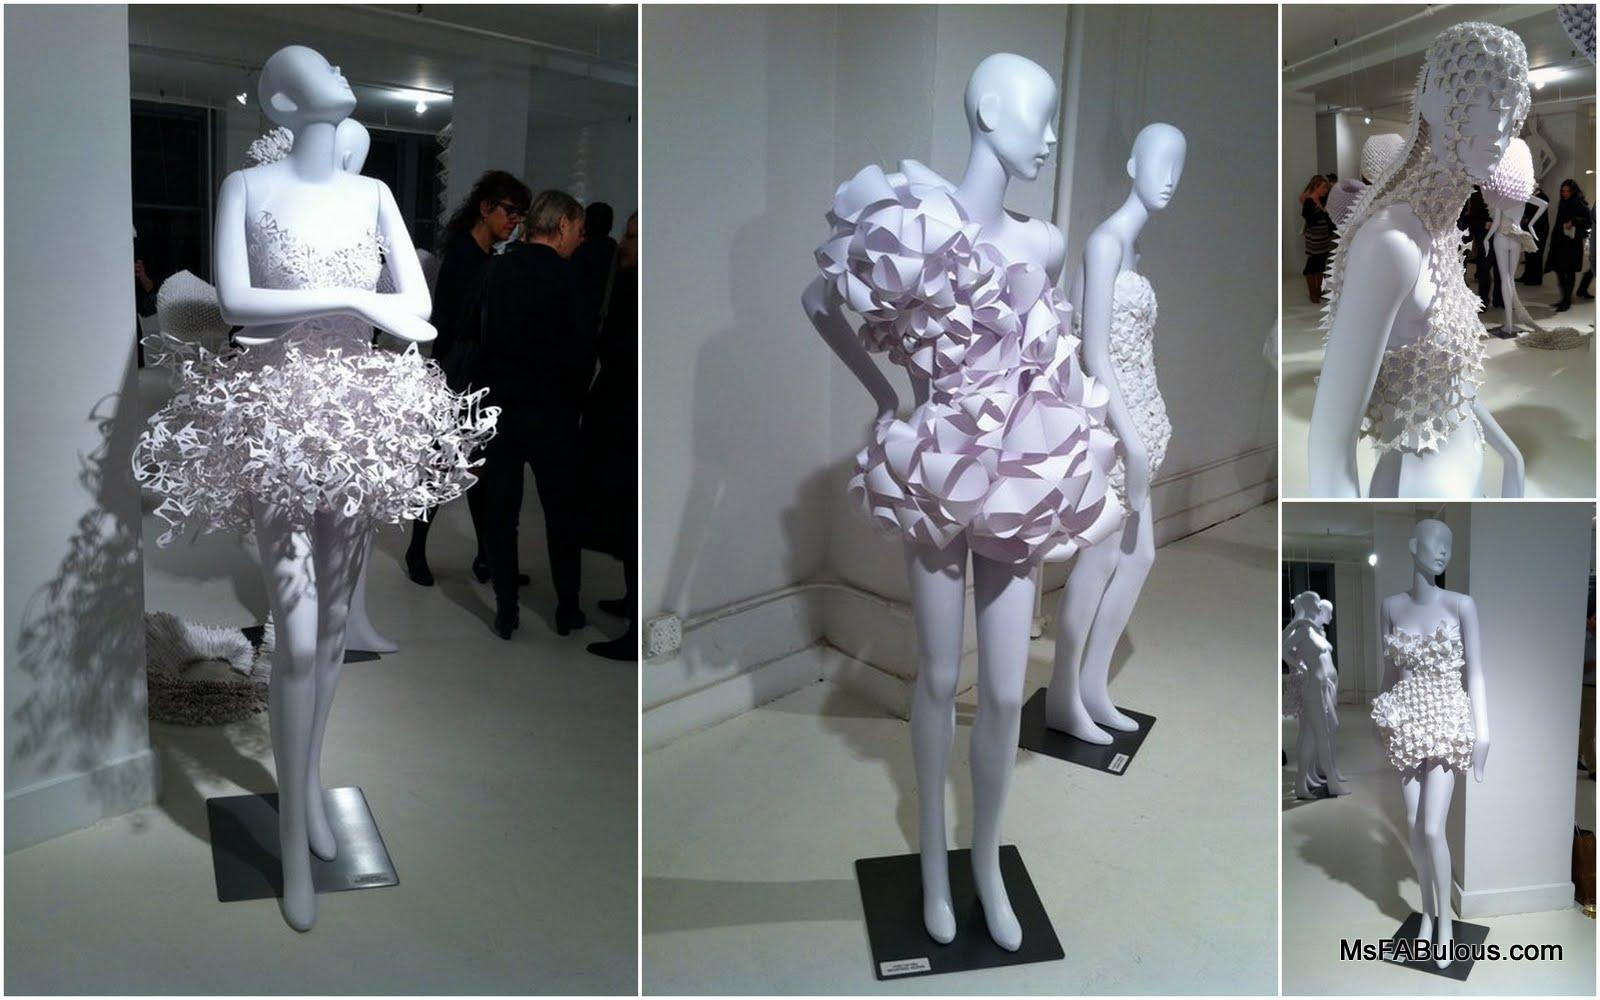 Ms Fabulous Pratt Paper Ralph Pucci Exhibit Fashion Design Indie Clothing Style Beauty